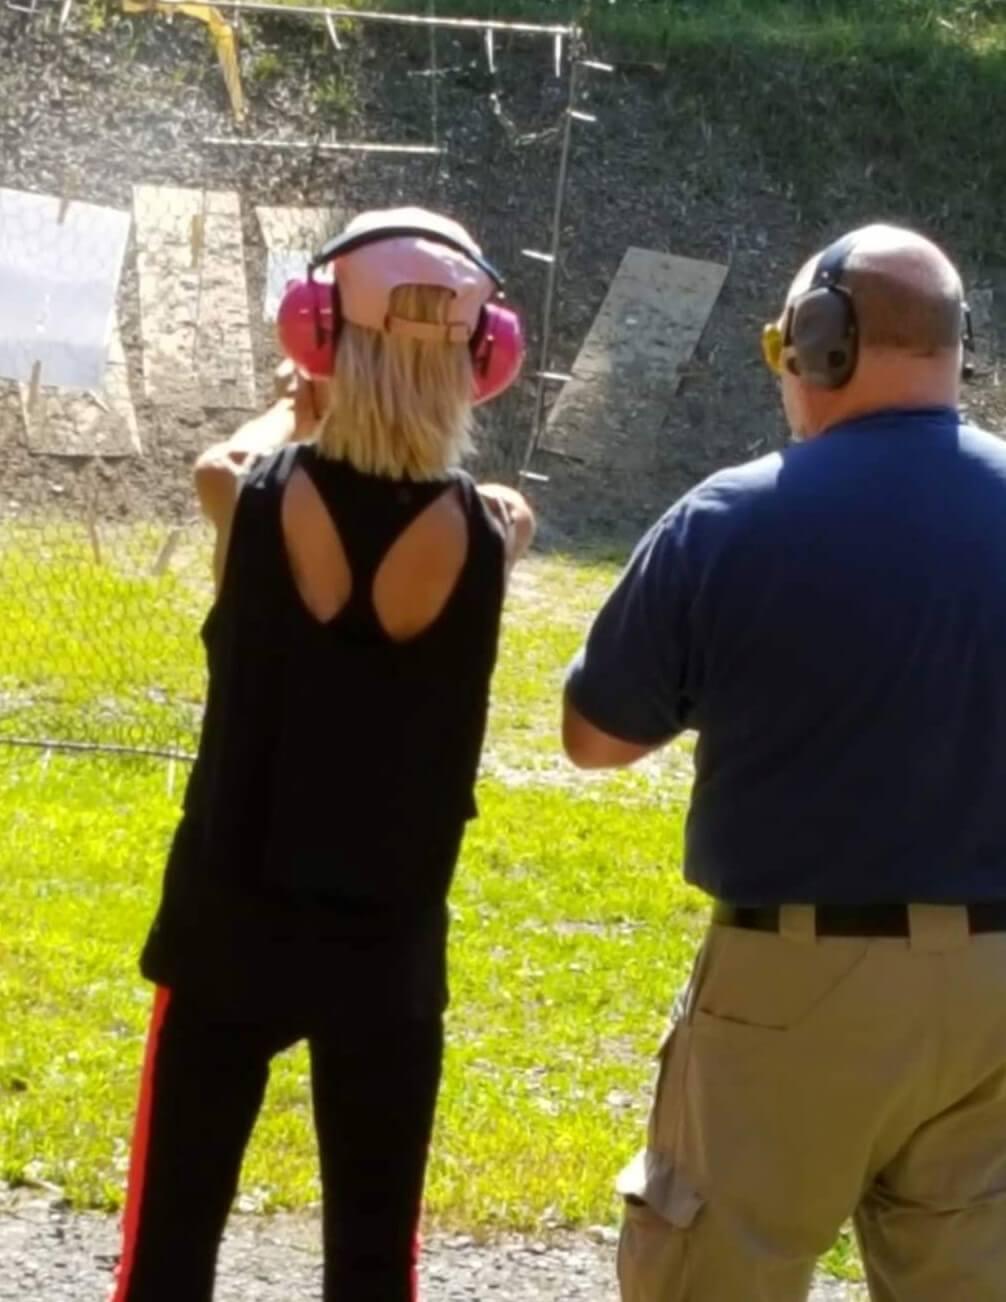 Leominster Firearms Training Outdoor Range Female Student